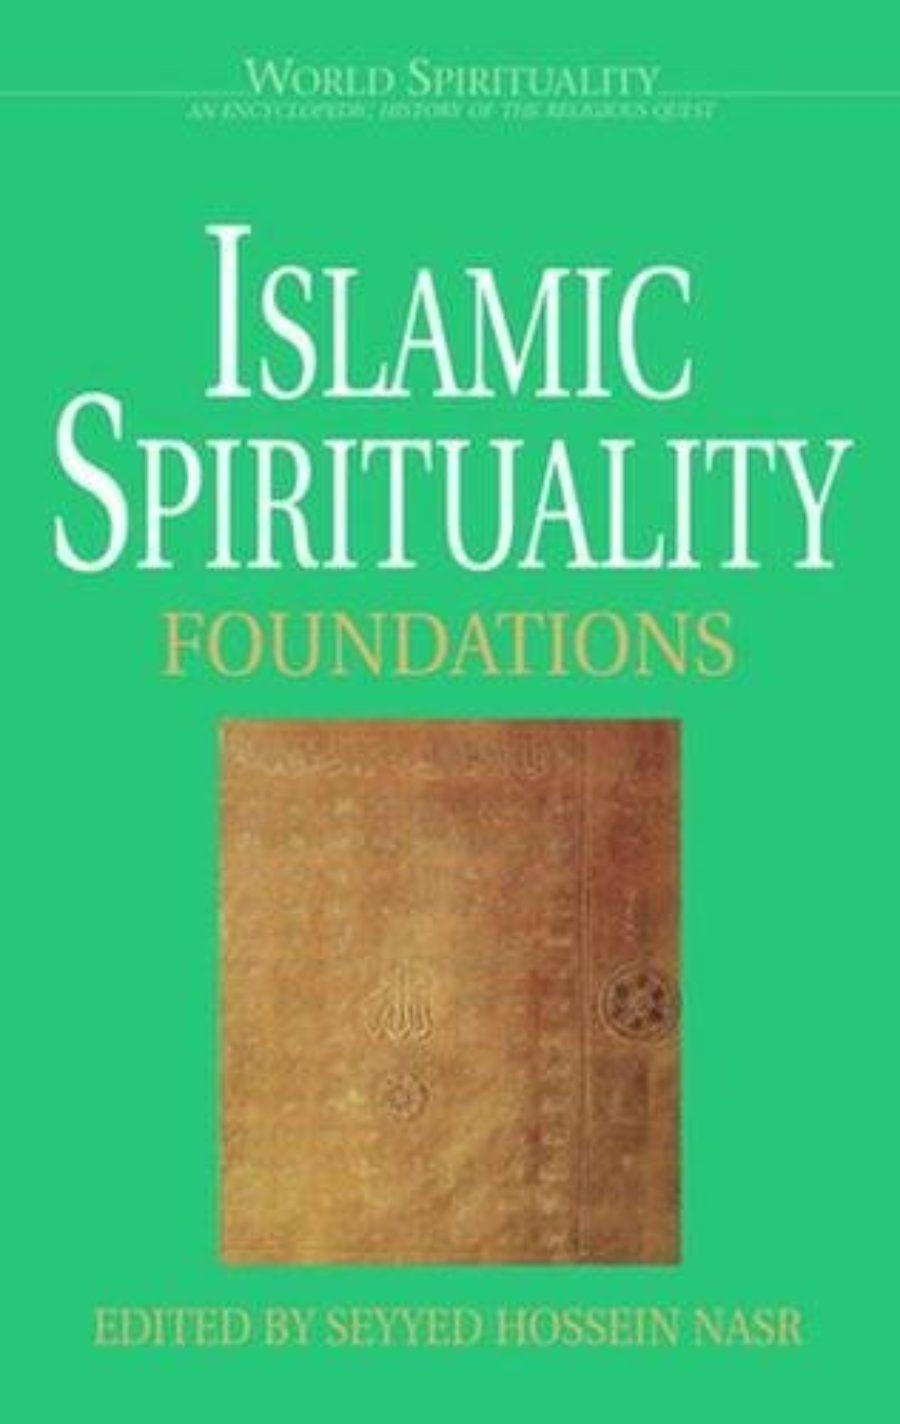 Omid Safi Seemi Bushra Ghazi The Spirit Of Islam The On Being